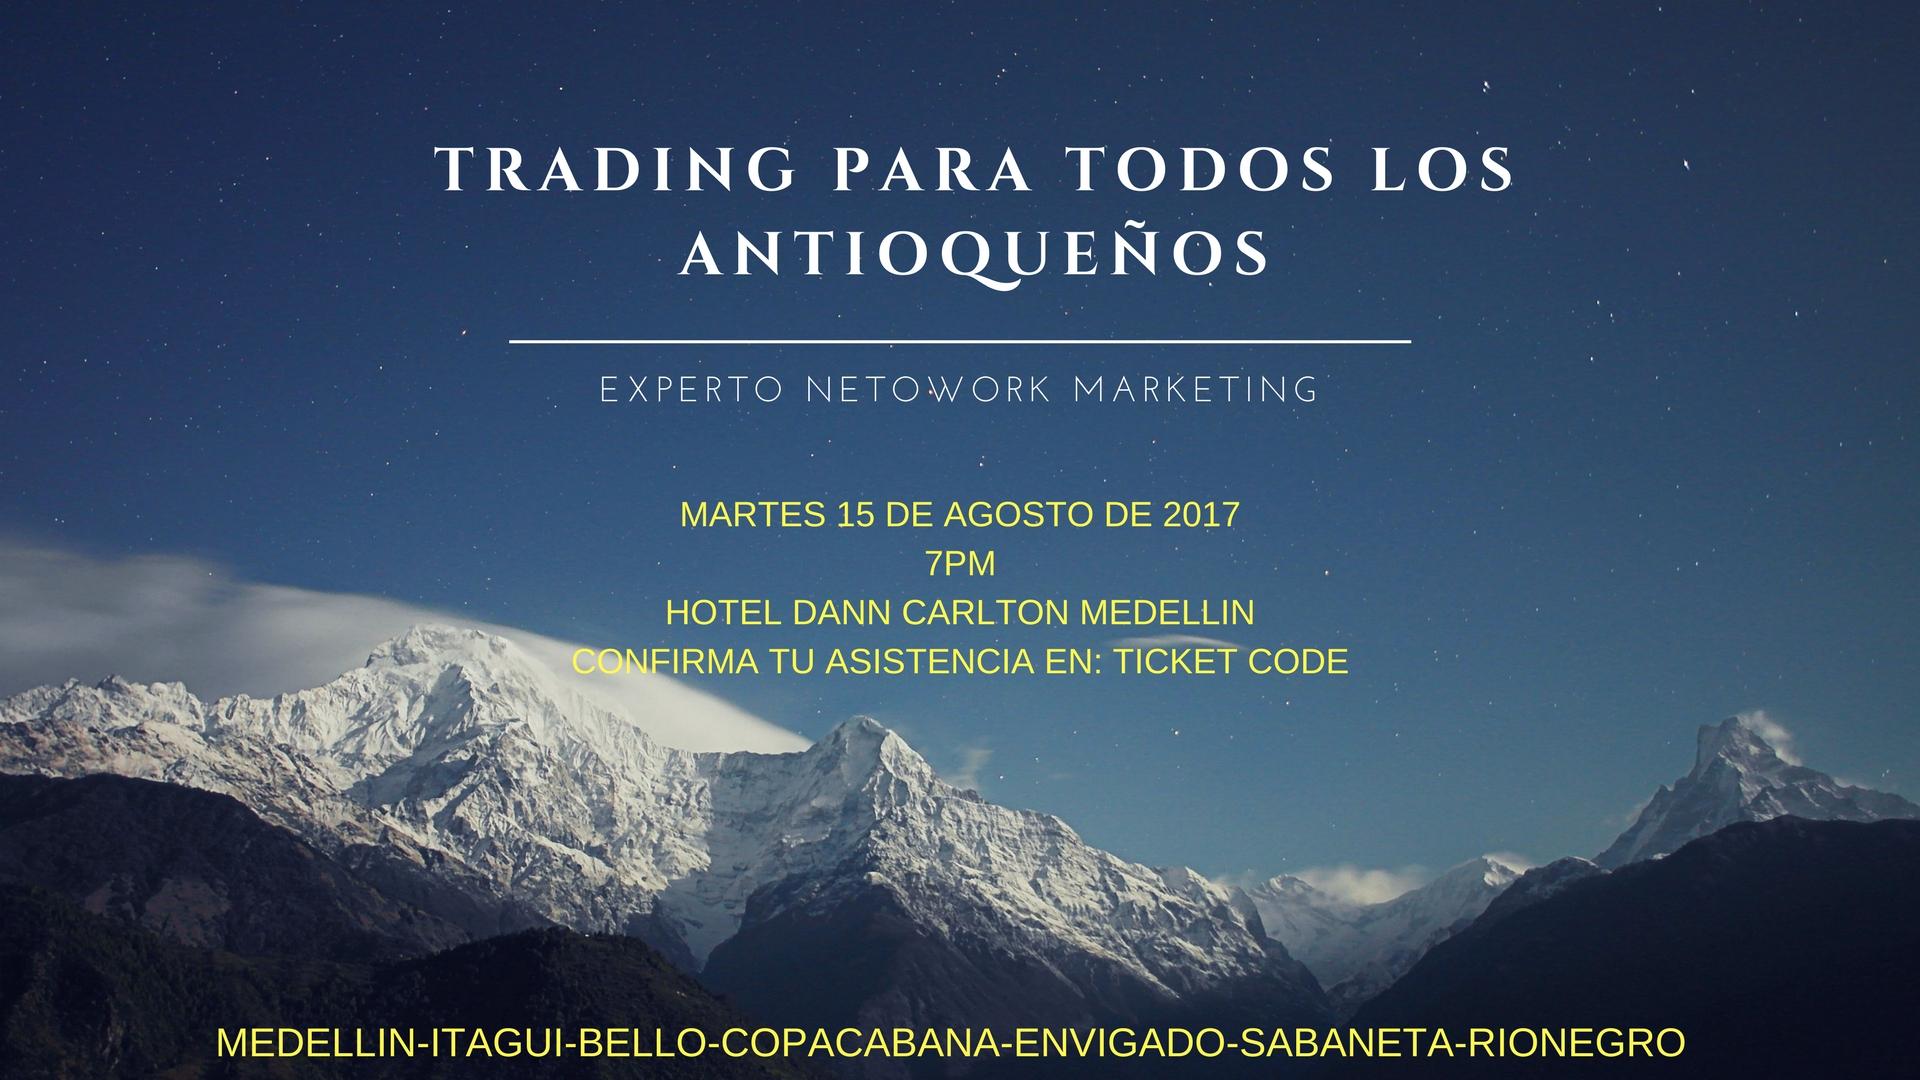 Trading_para_todos_los_antioque_os__1_